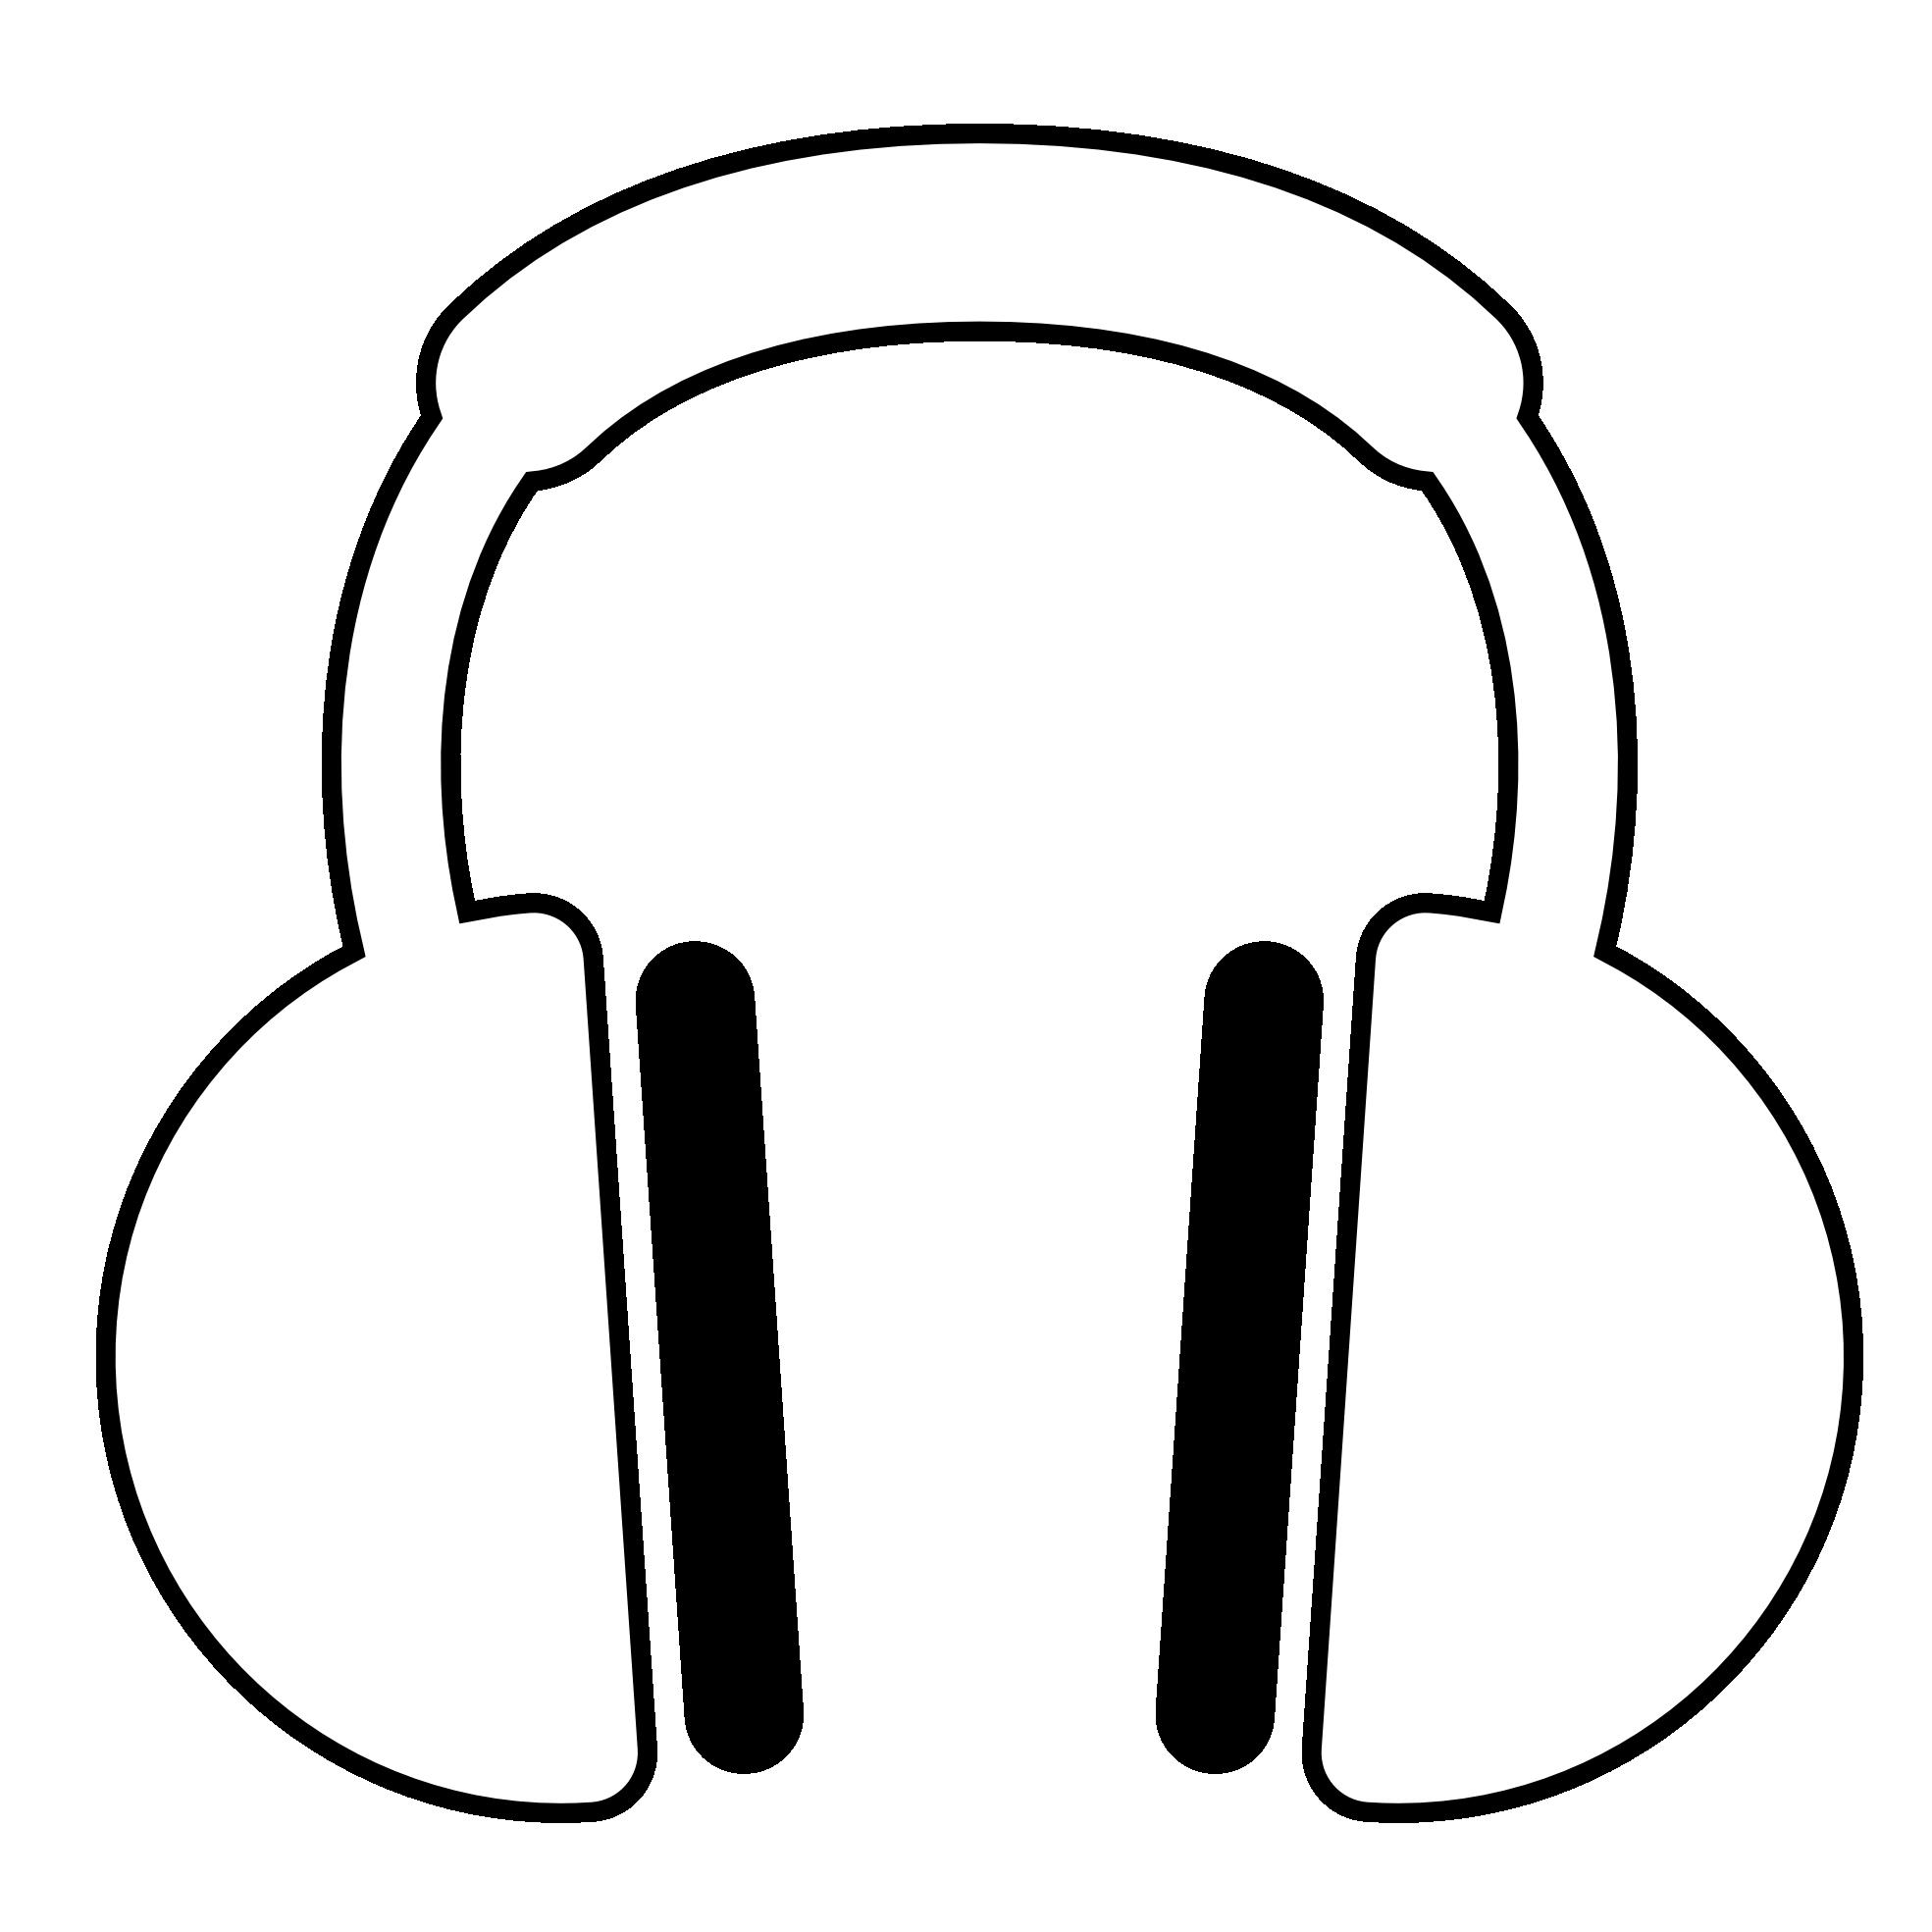 Drawn musician headphone Headphones drawing line headphones drawing